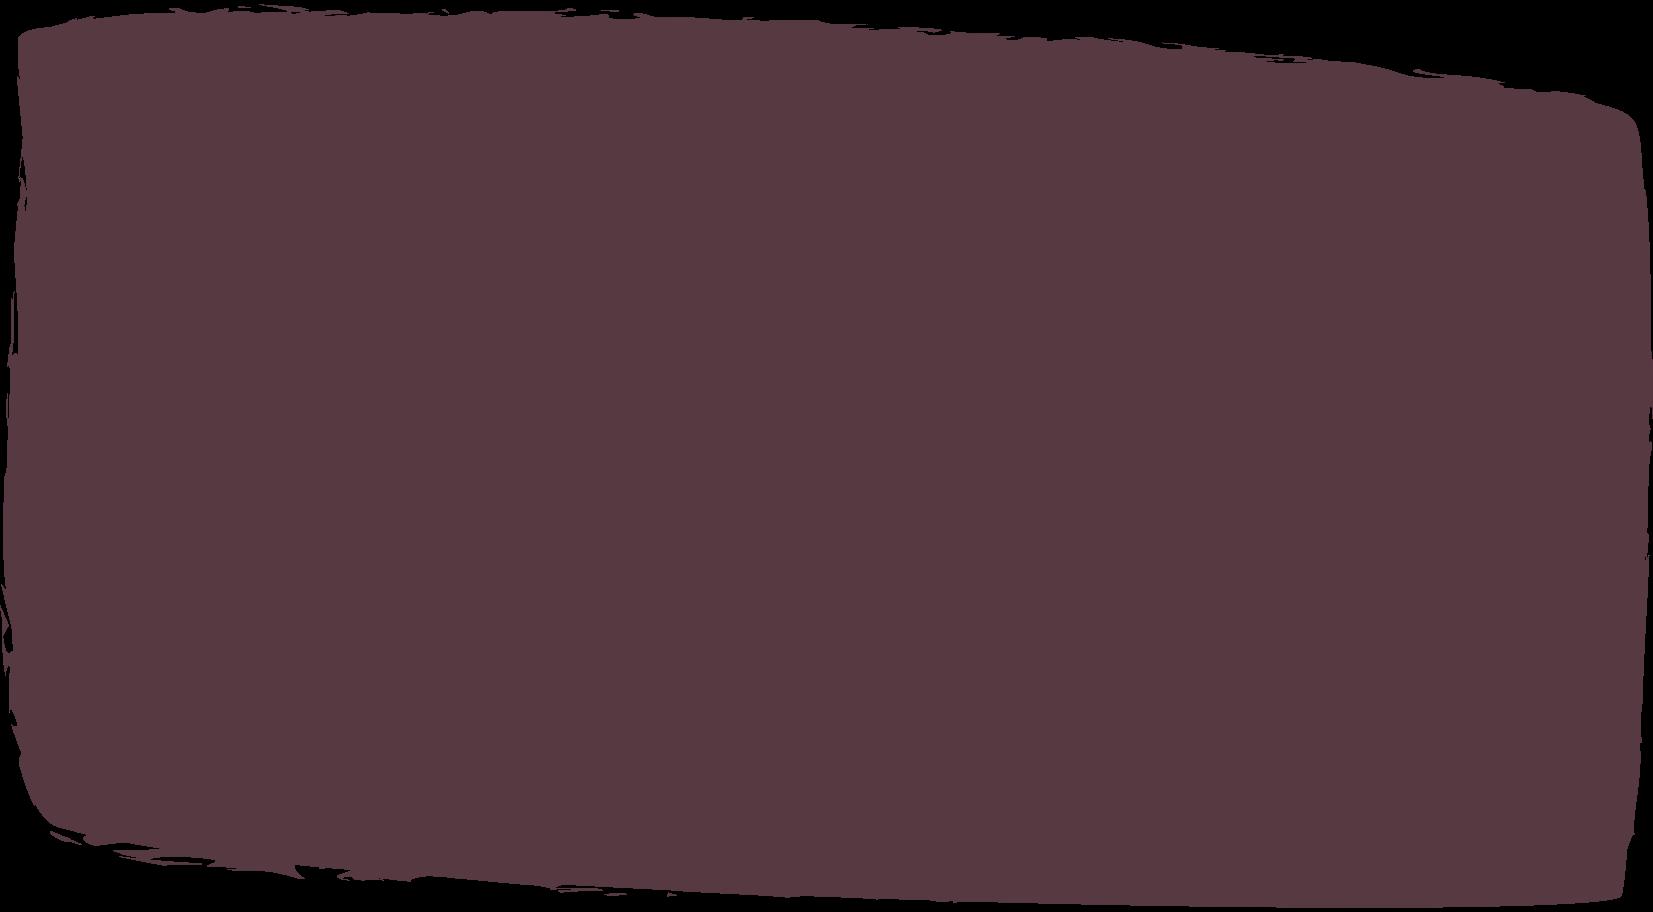 rectangle-dark-brown Clipart illustration in PNG, SVG